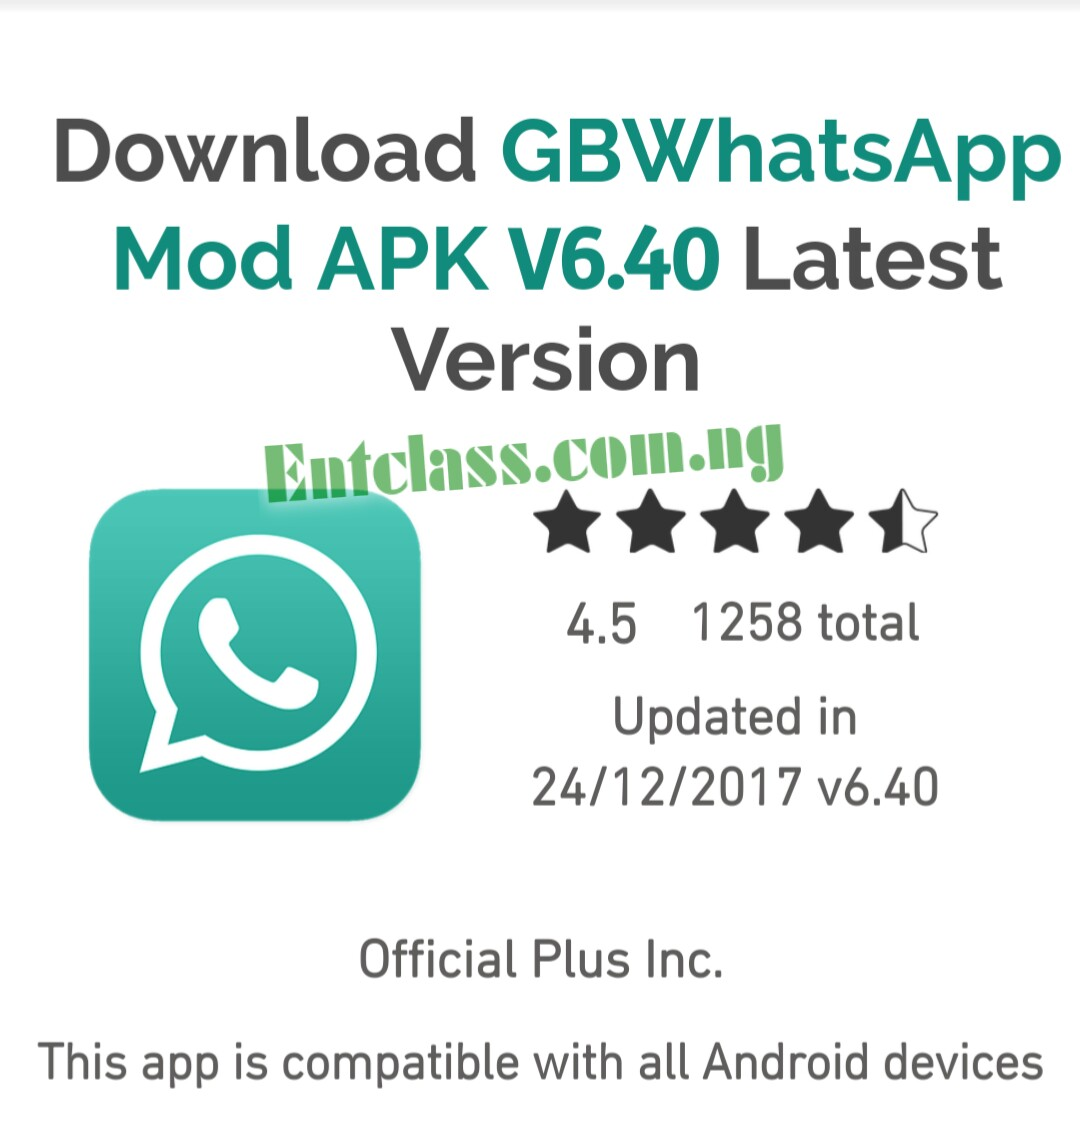 whatsapp gb latest version apk